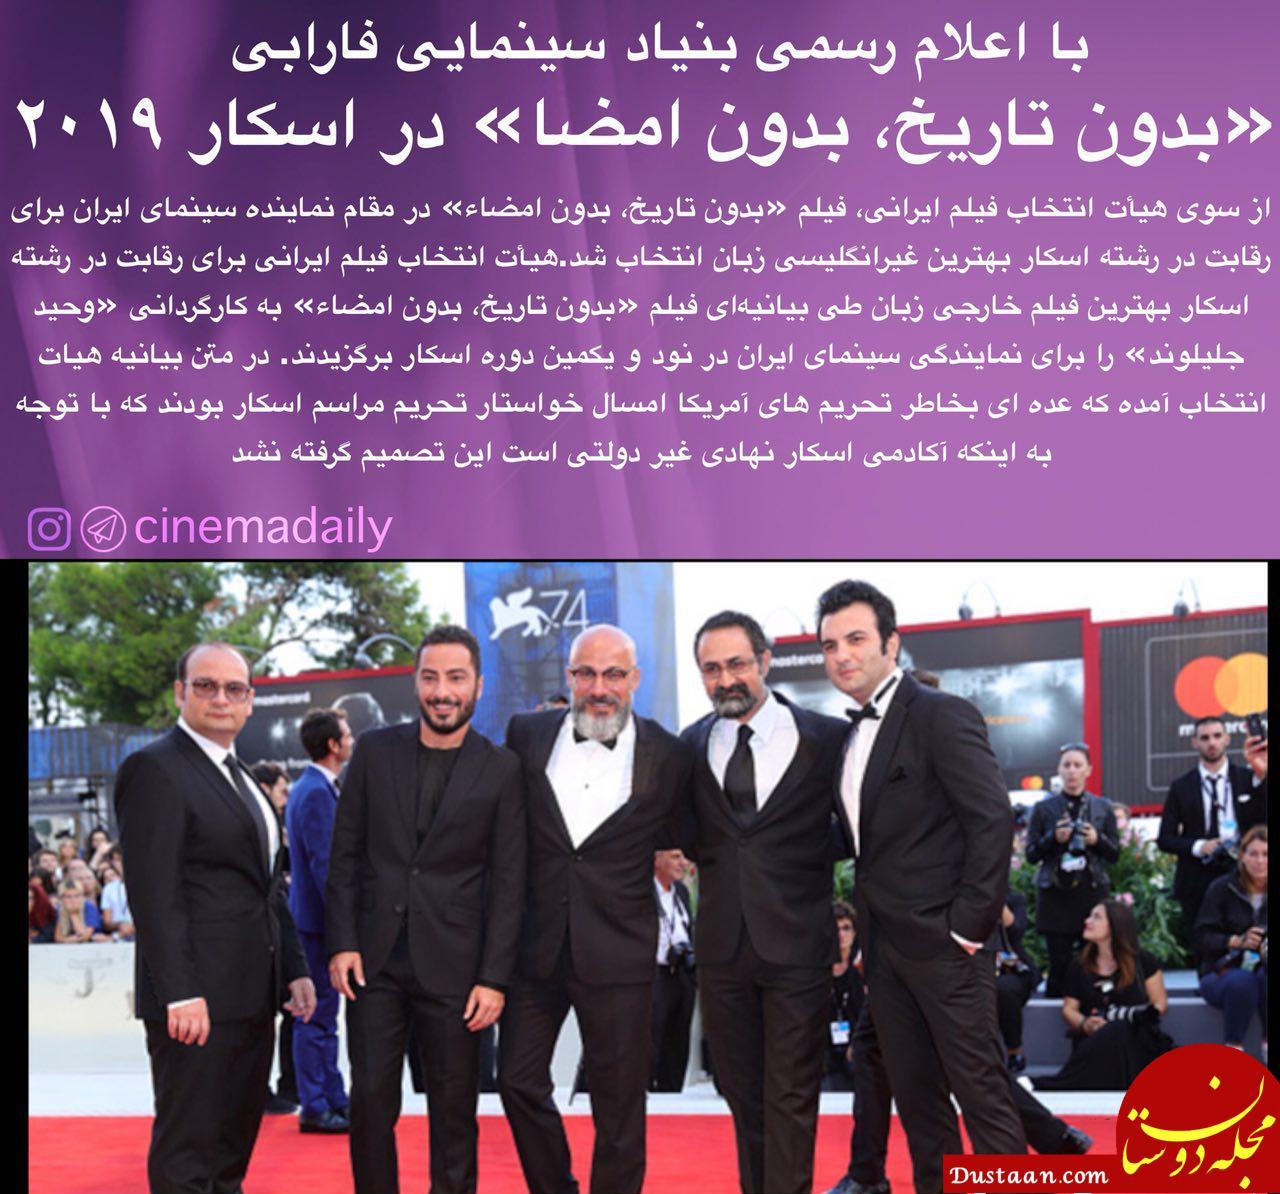 www.dustaan.com «بدون تاریخ بدون امضا» نماینده ایران در اسکار 2019